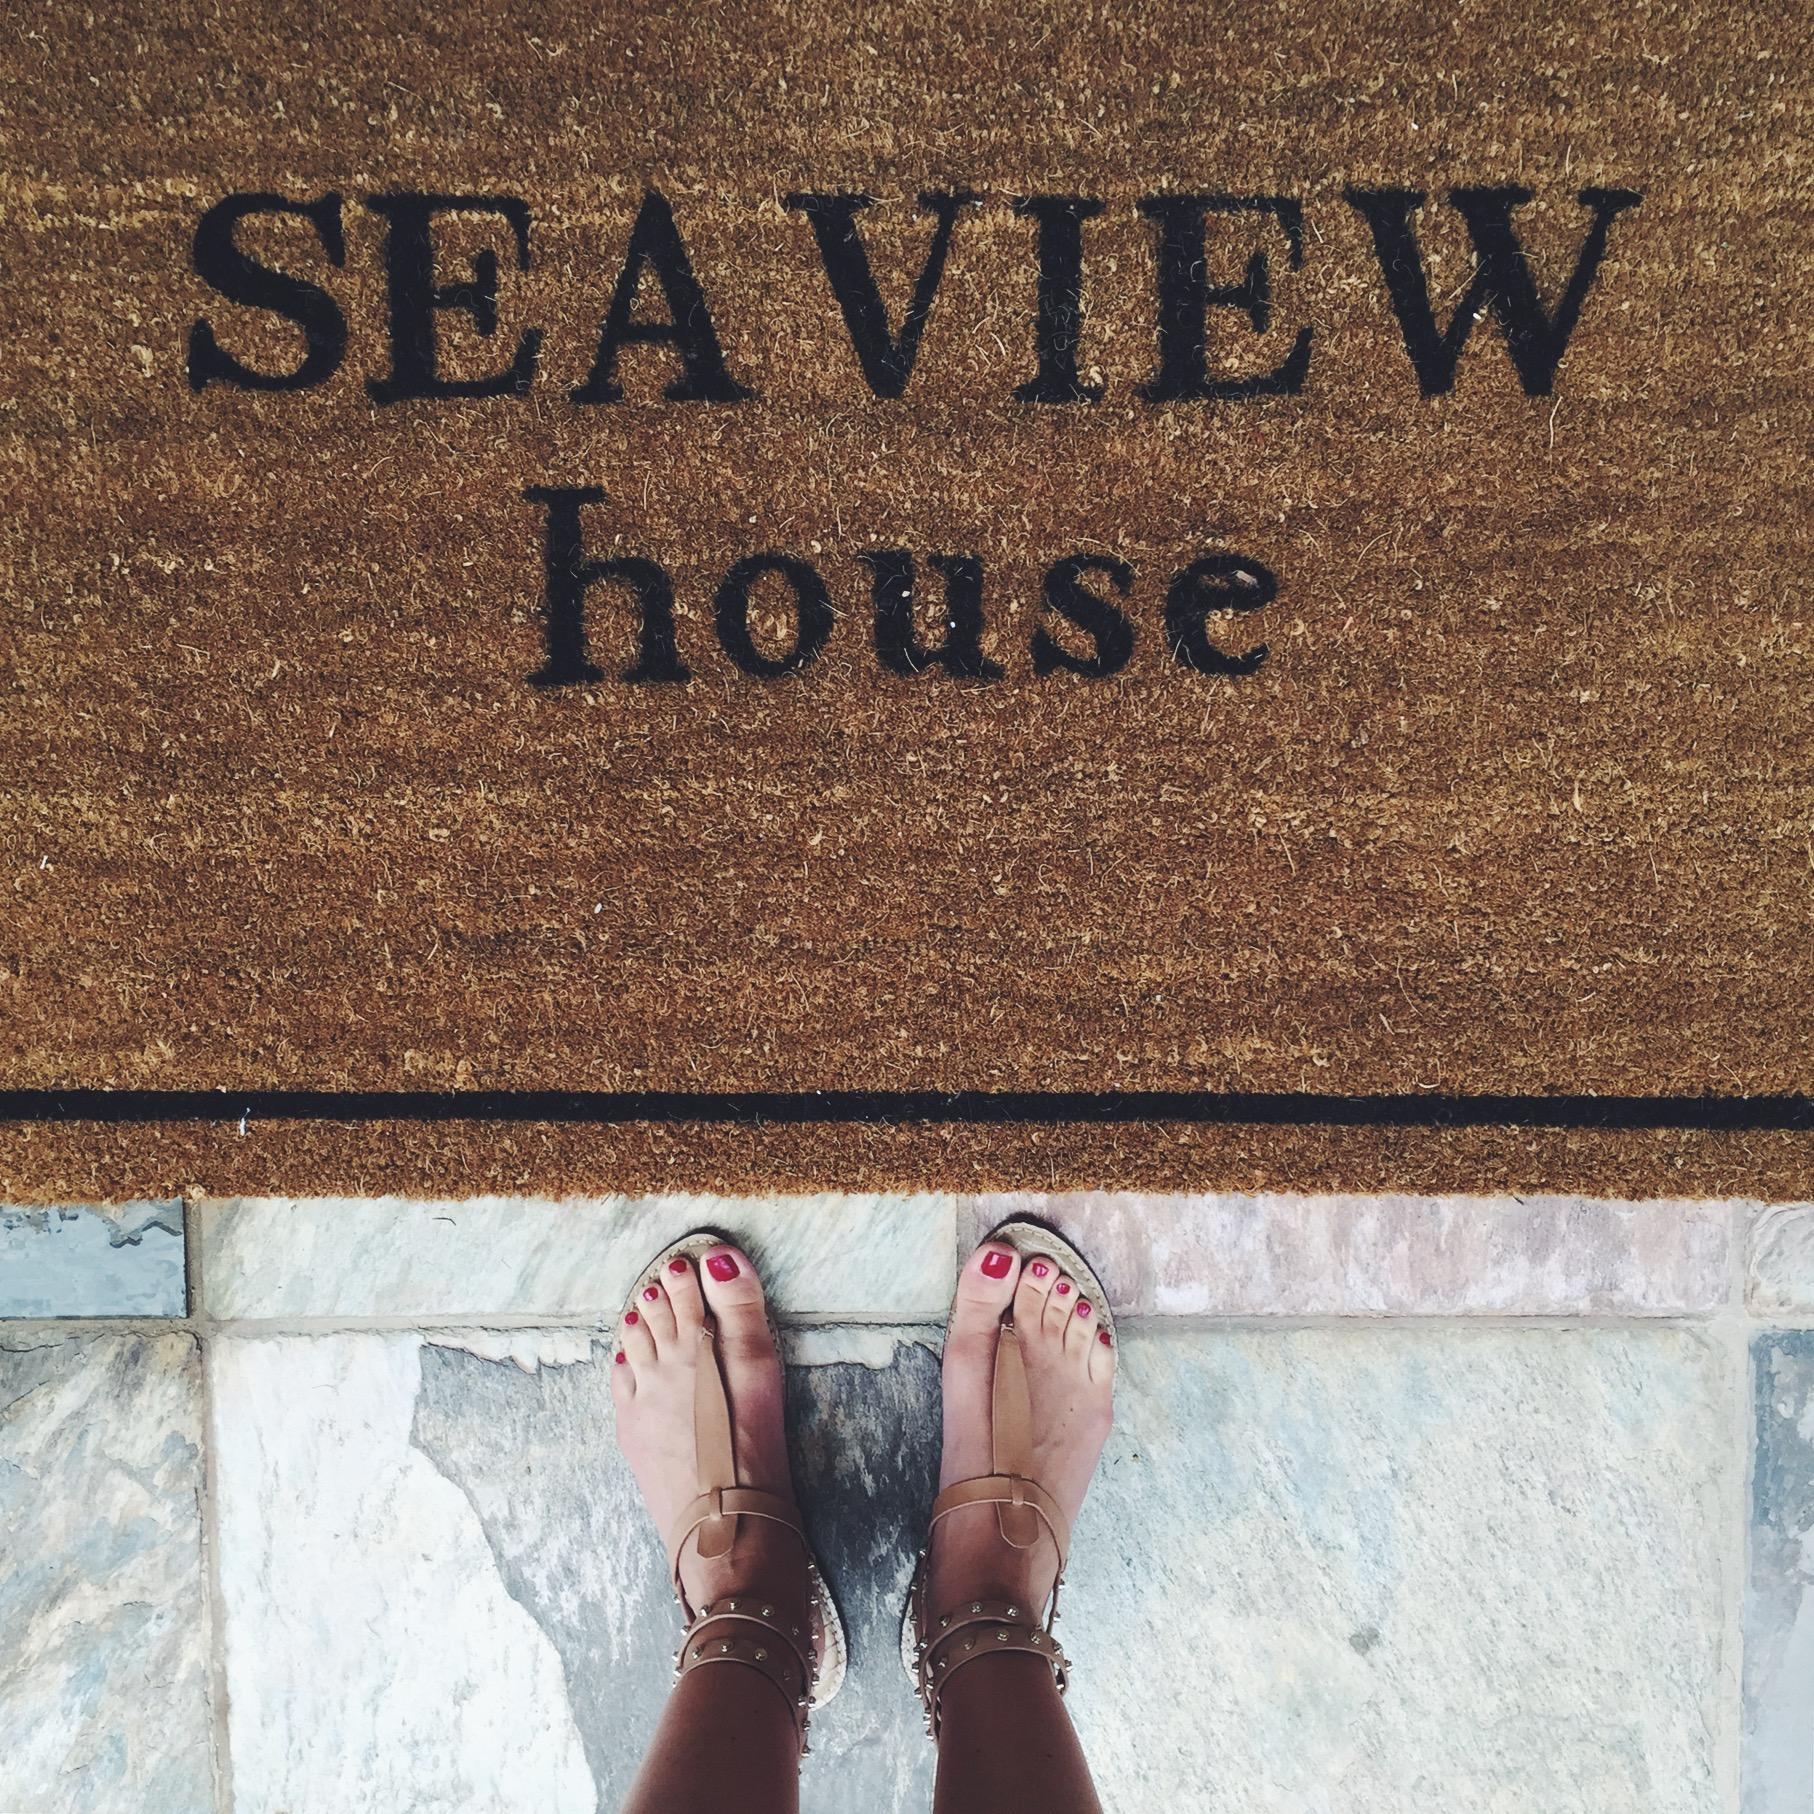 Our beach house in San Diego!